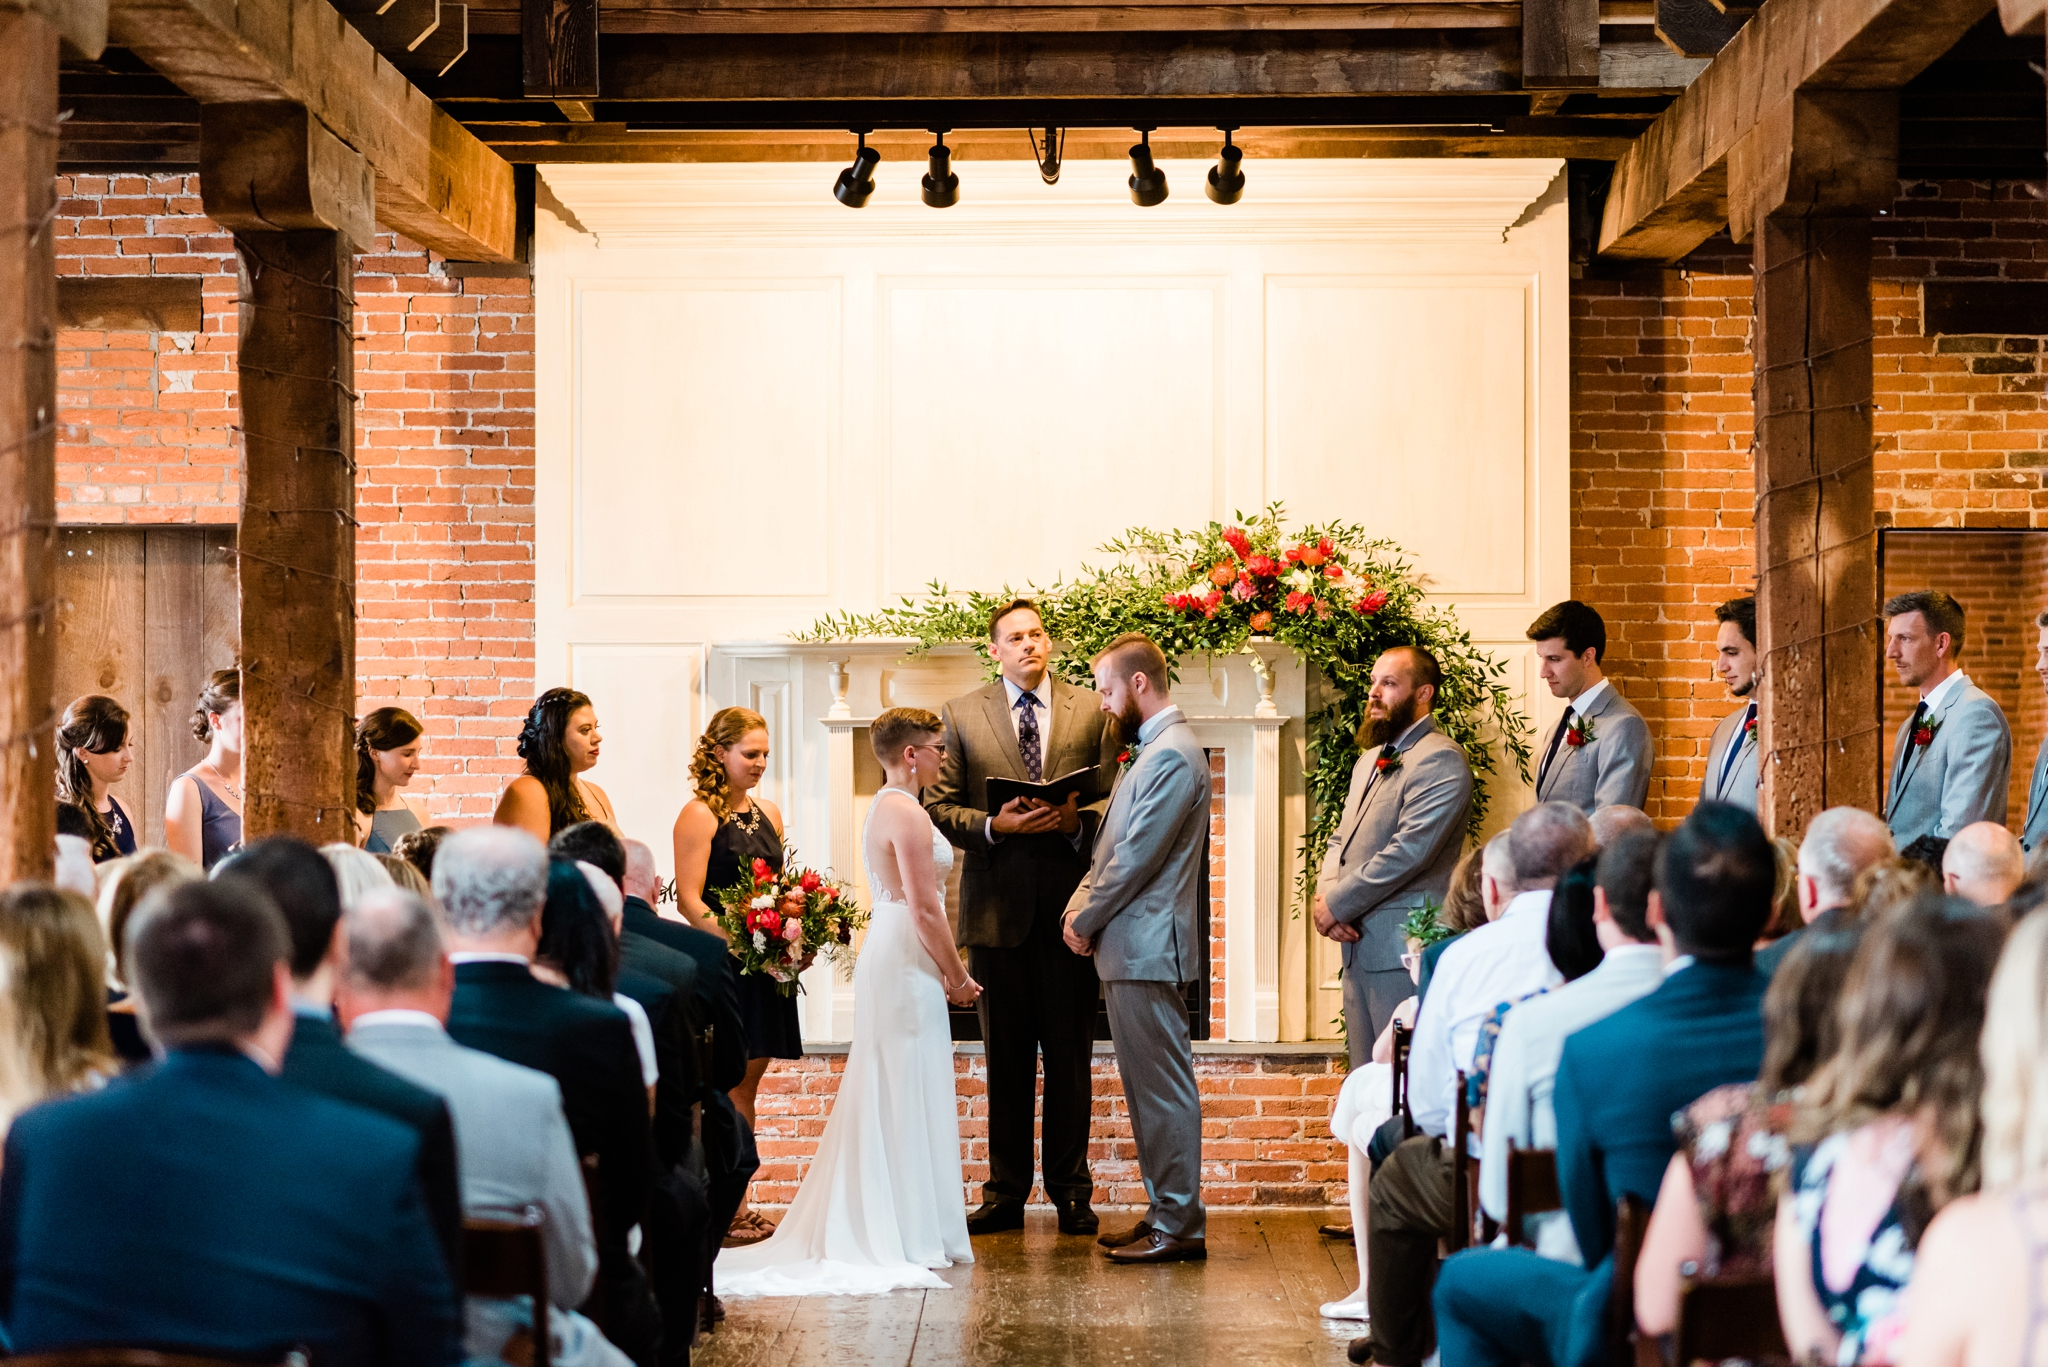 Emily Grace Photography, Lancaster PA Wedding Photographer, The Booking House Wedding Venue, Manheim PA Wedding Venue, The Booking House Manheim Ceremony Photos, Central PA Wedding Photographer